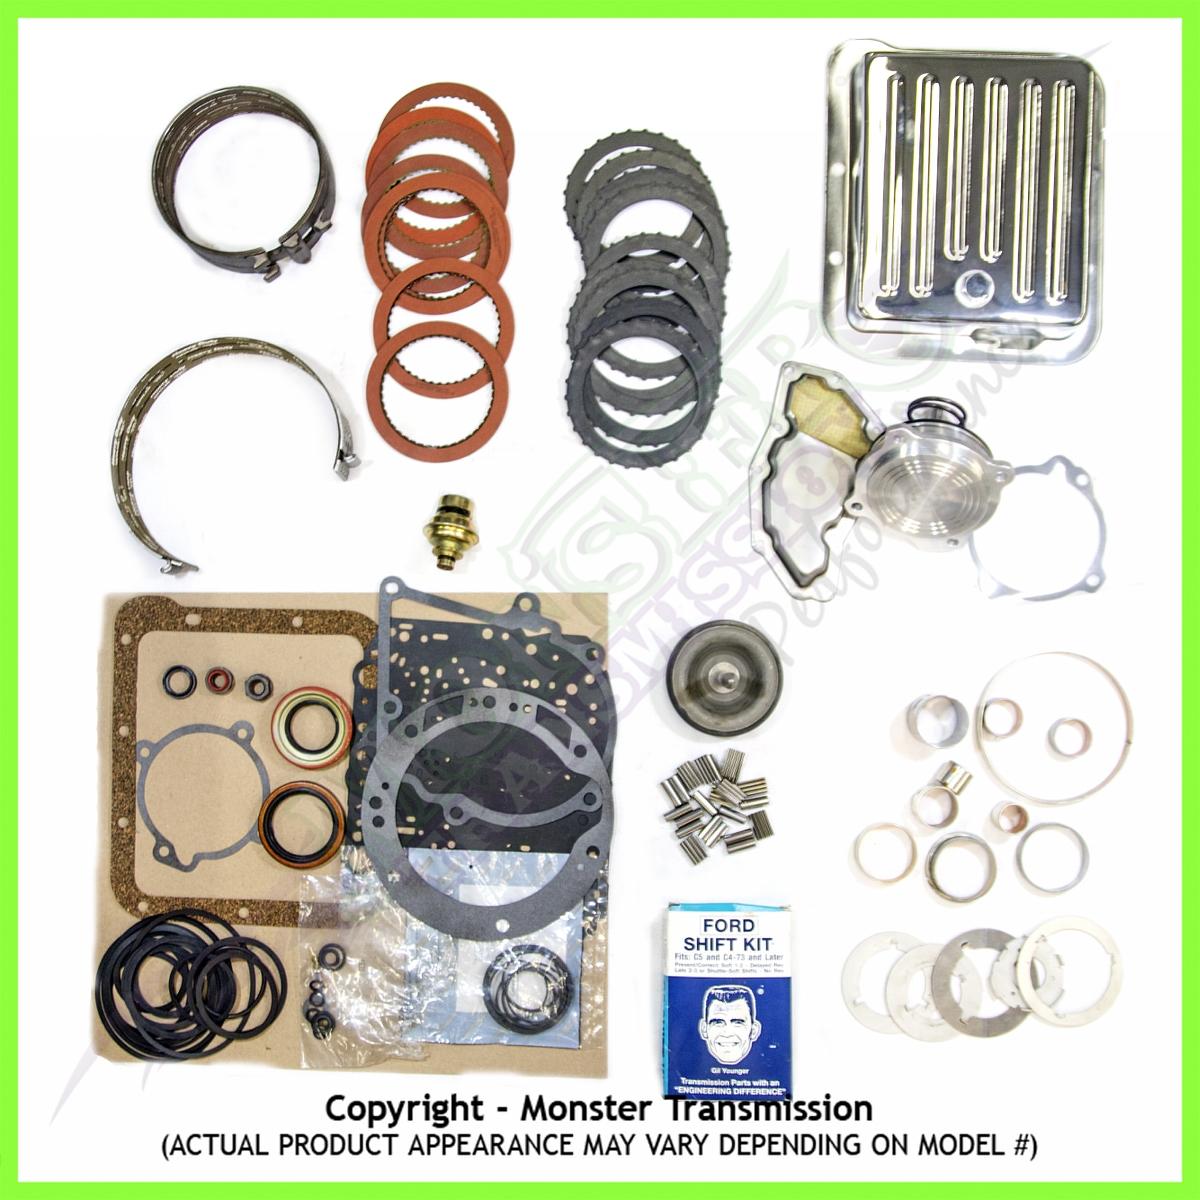 from Case tranny rebuild kits